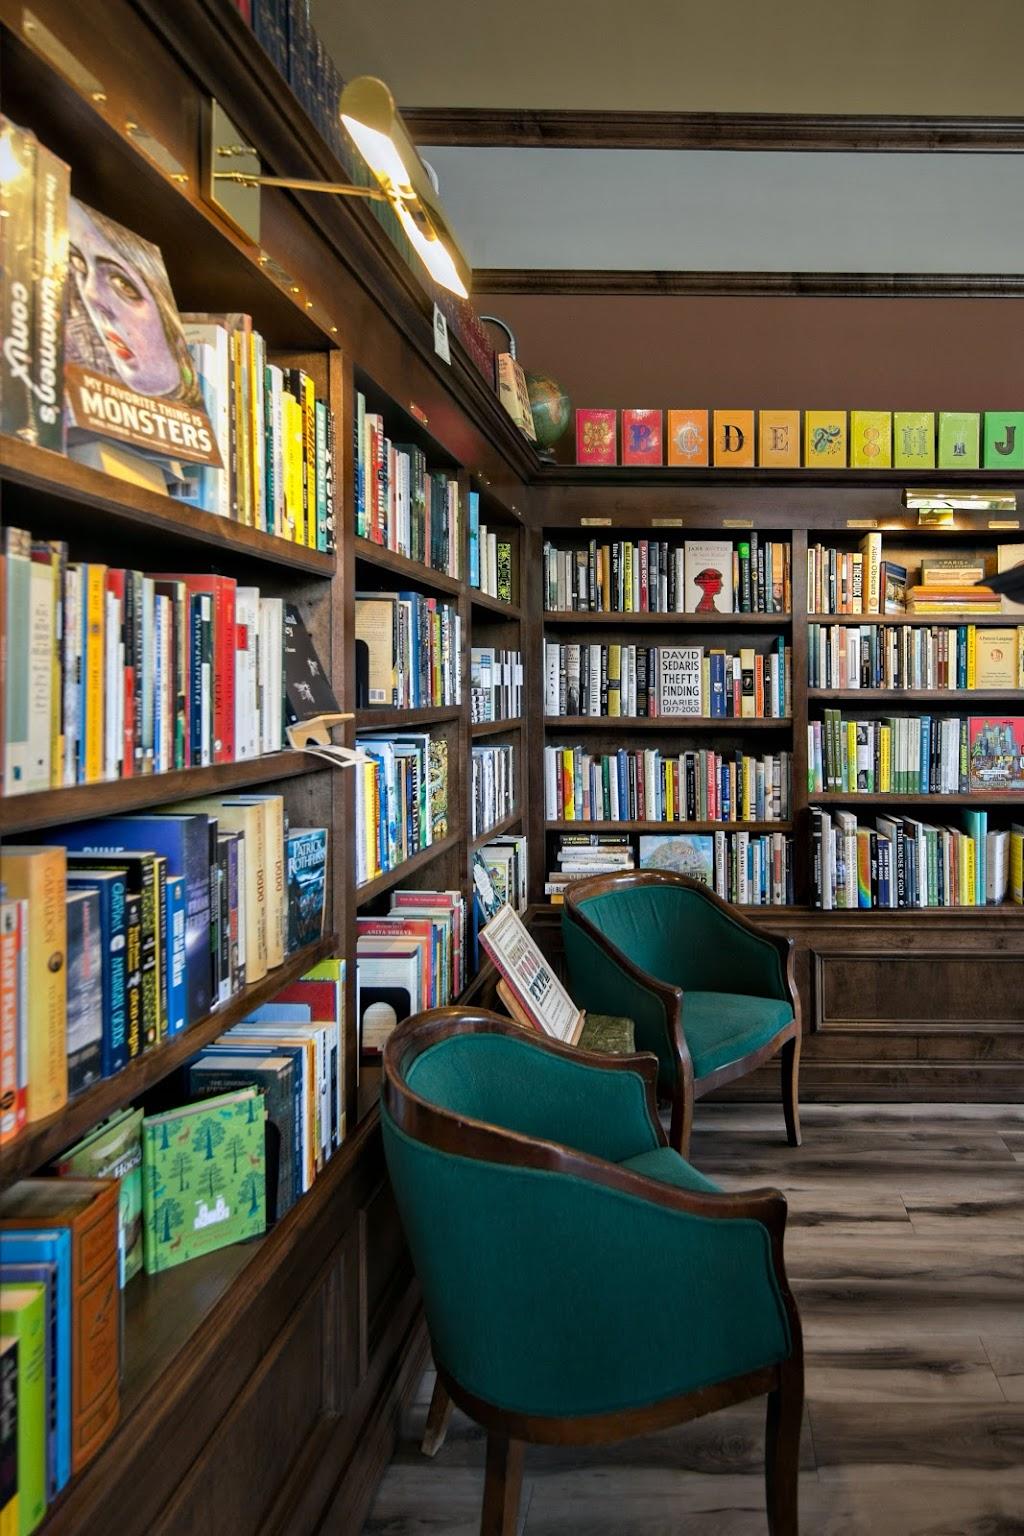 Hills & Hamlets Bookshop - book store  | Photo 5 of 10 | Address: 10625 Serenbe Ln B, Chattahoochee Hills, GA 30268, USA | Phone: (470) 488-0330